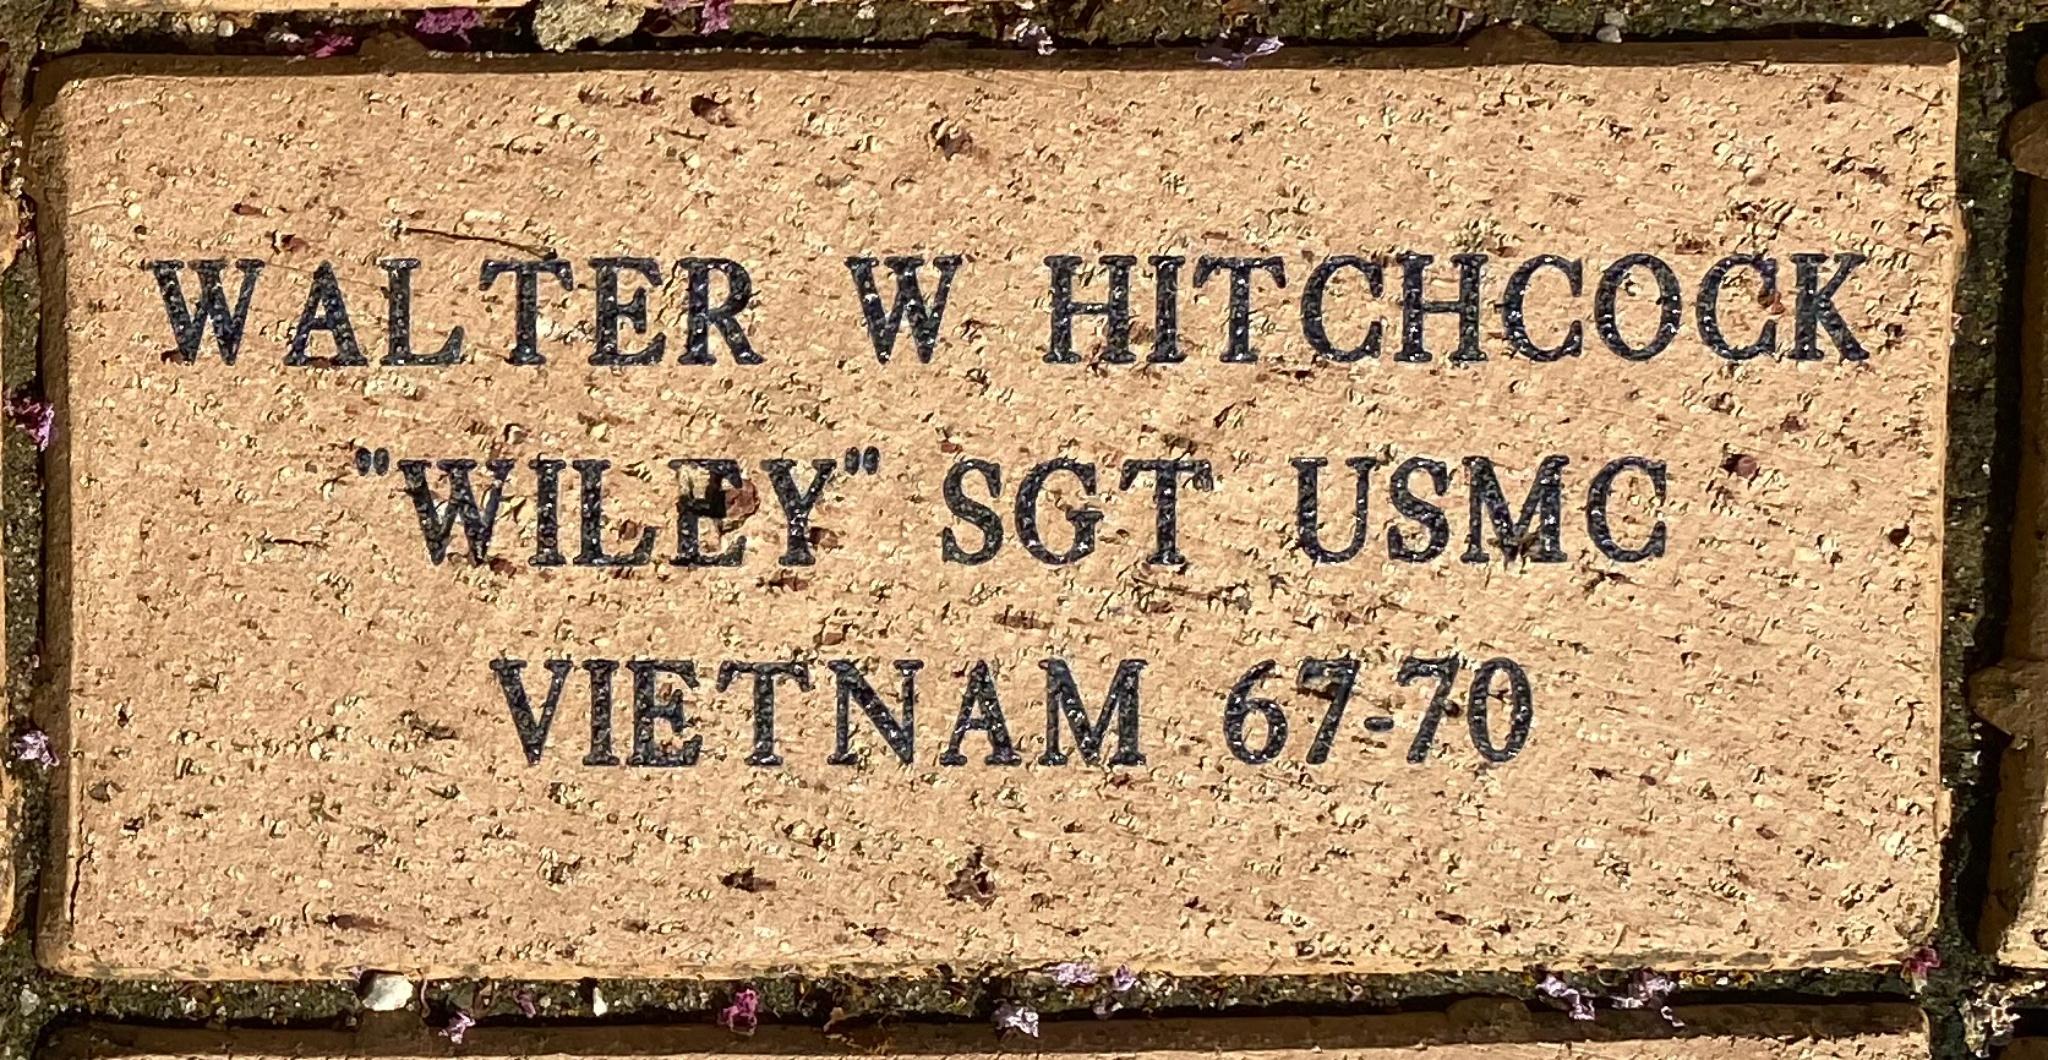 "WALTER W HITCHCOCK ""WILEY"" SGT USMC VIETNAM 67-70"